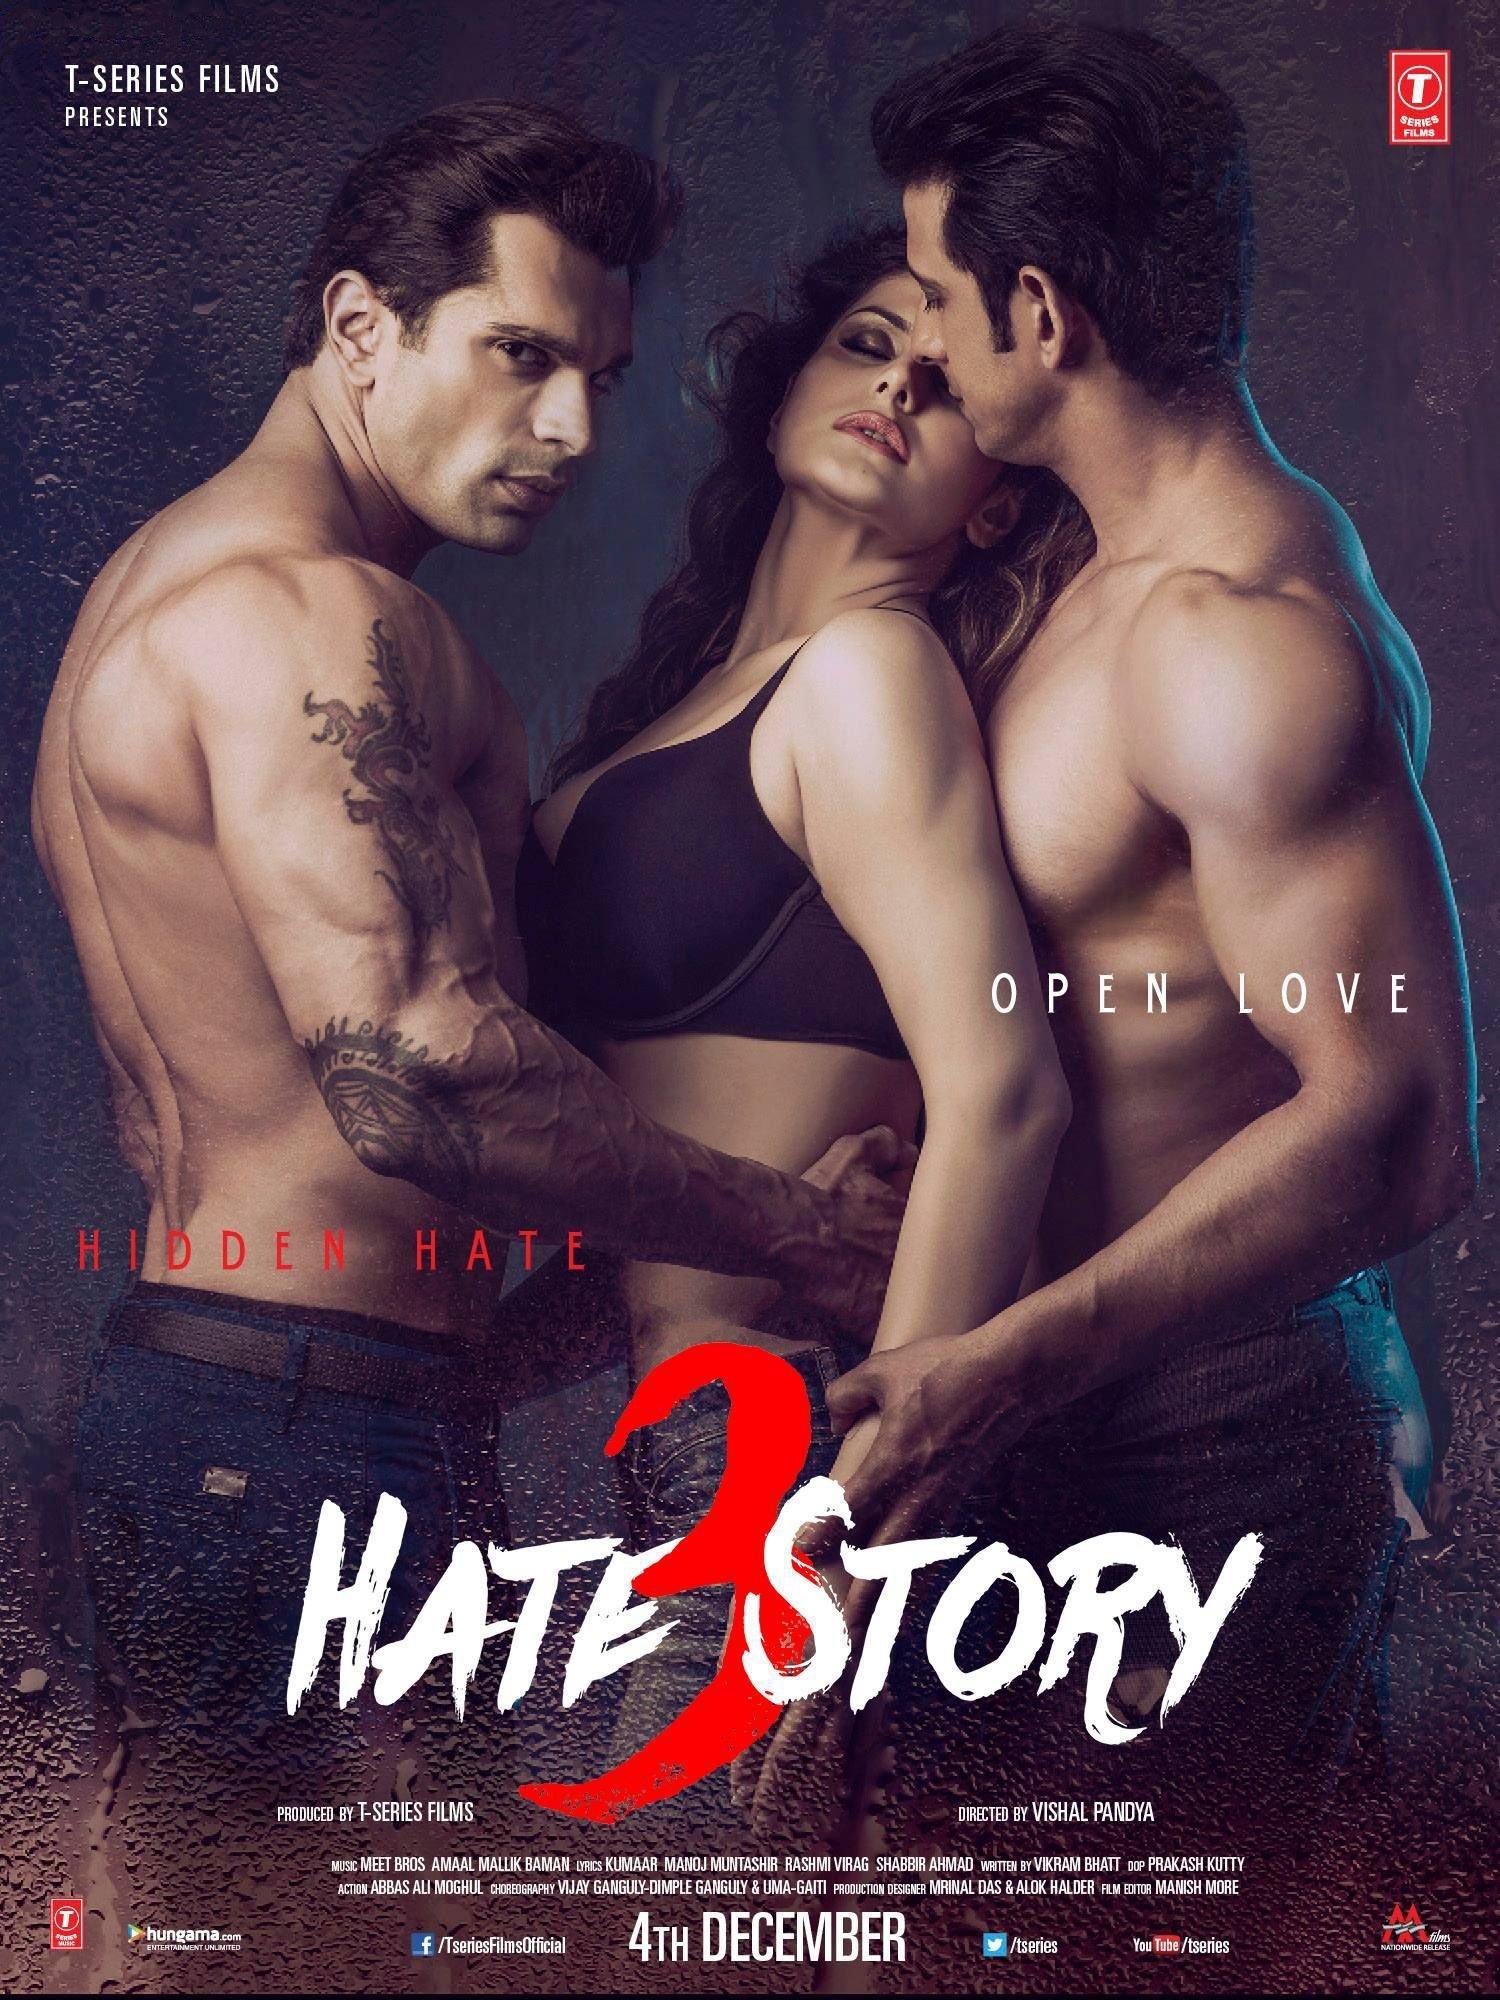 Hate Story 3 (2015) Hindi Full Movie 480p, 720p Download